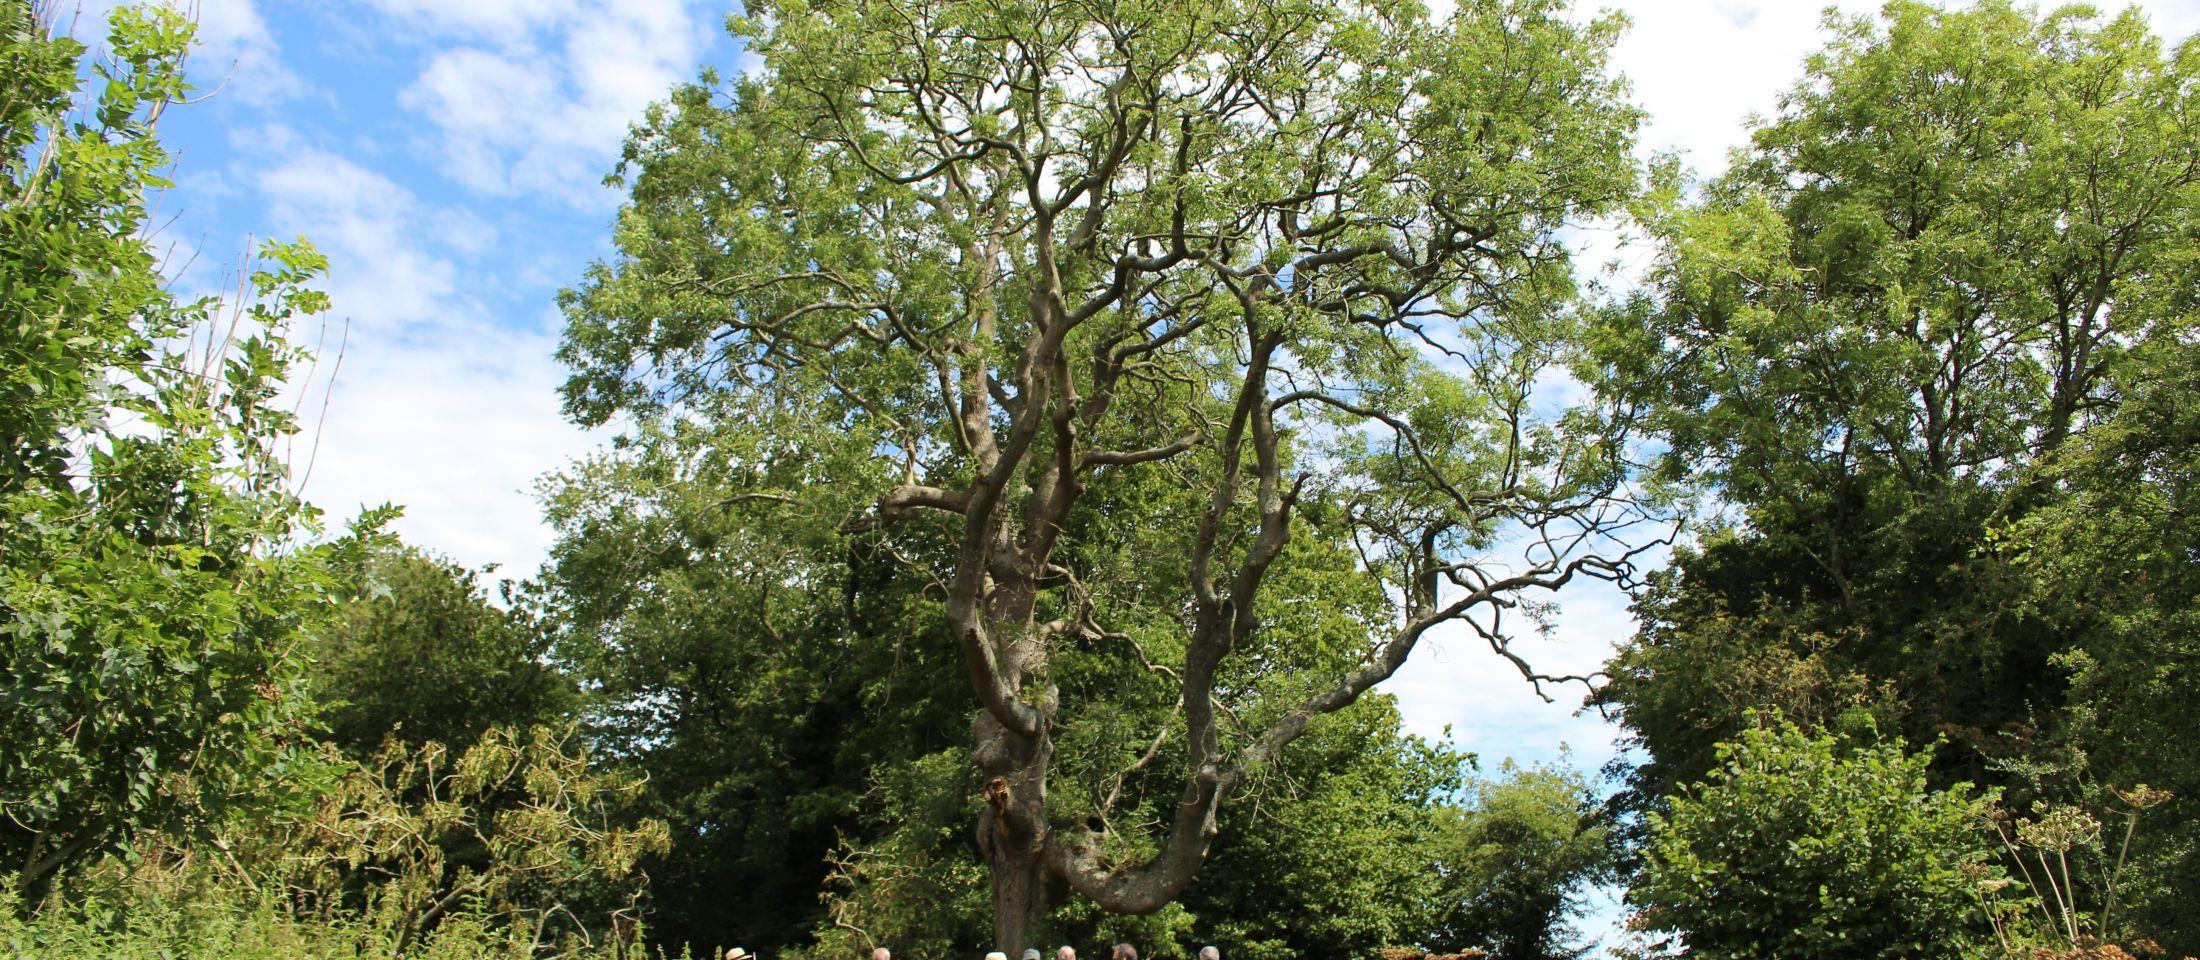 Crundale ash tree. Photo: James Collie